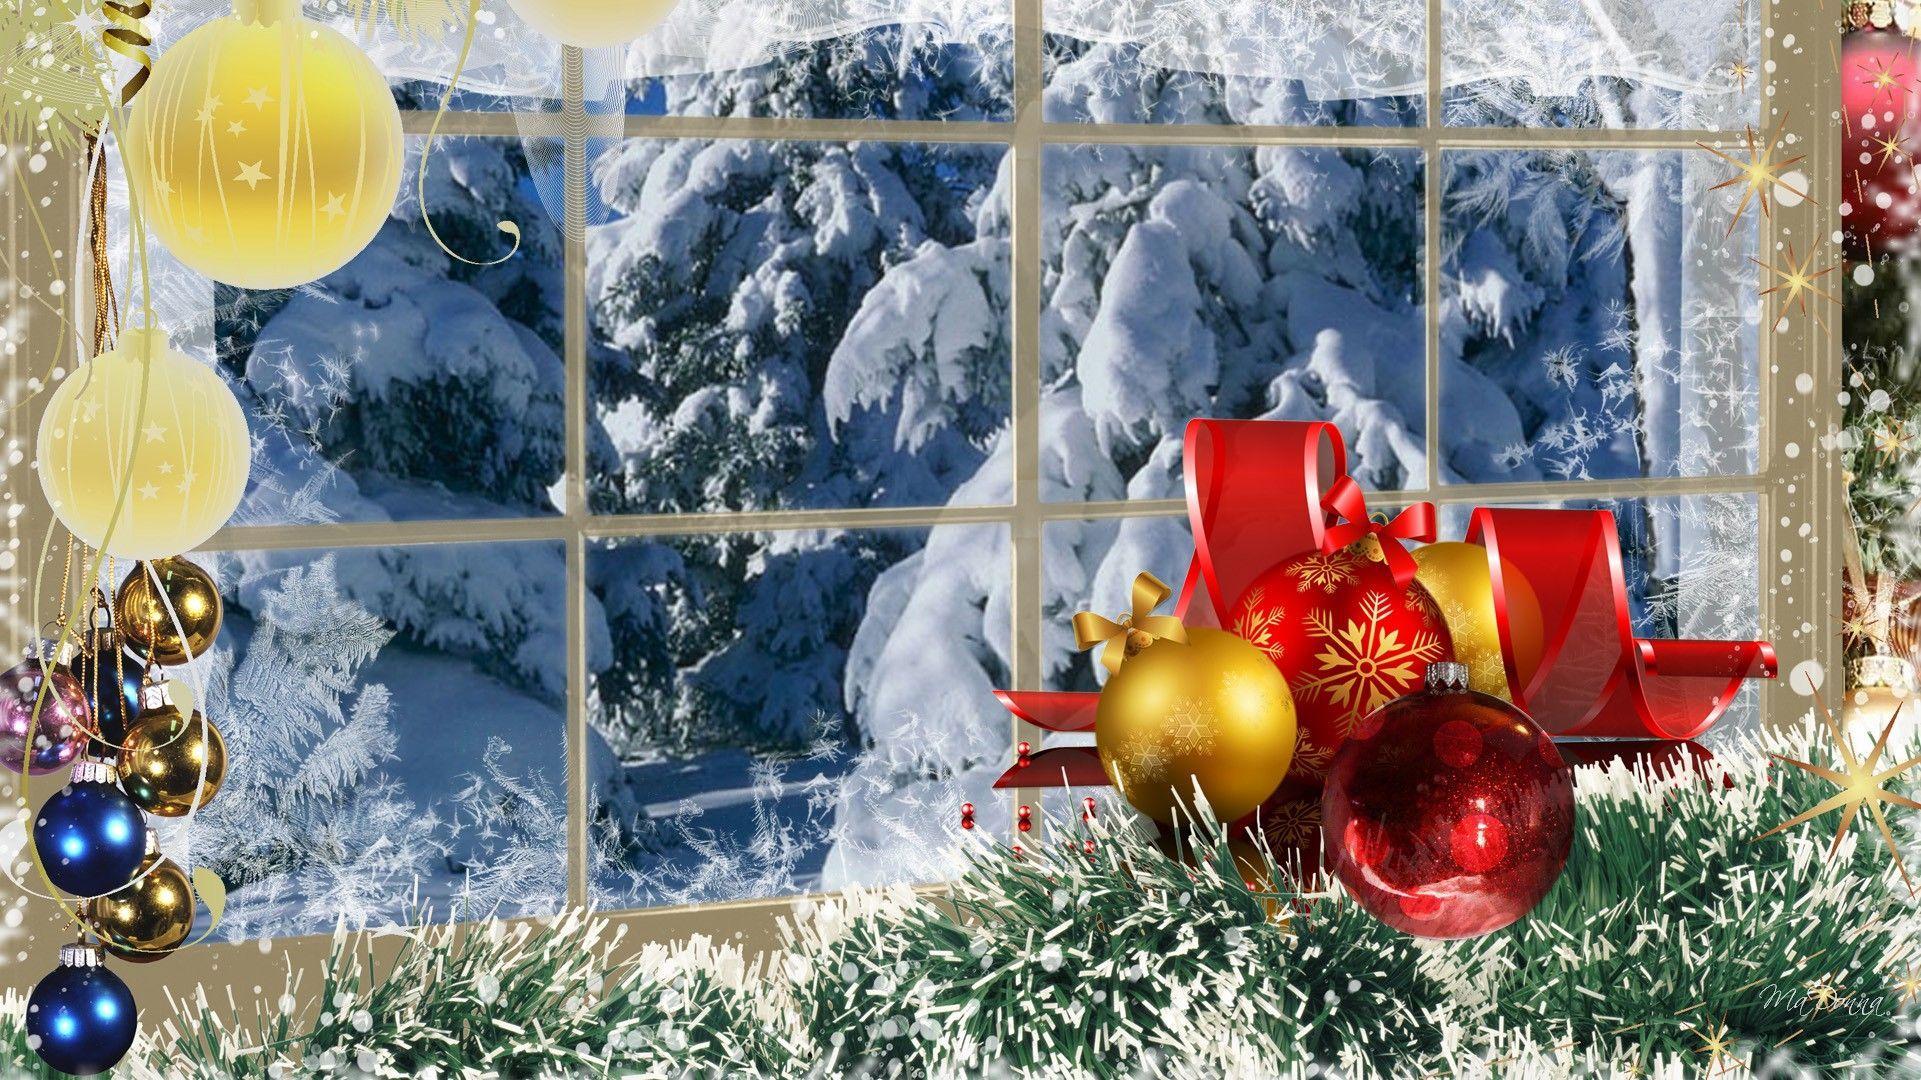 Christmas winter scenes wallpaper   SF Wallpaper 1921x1080